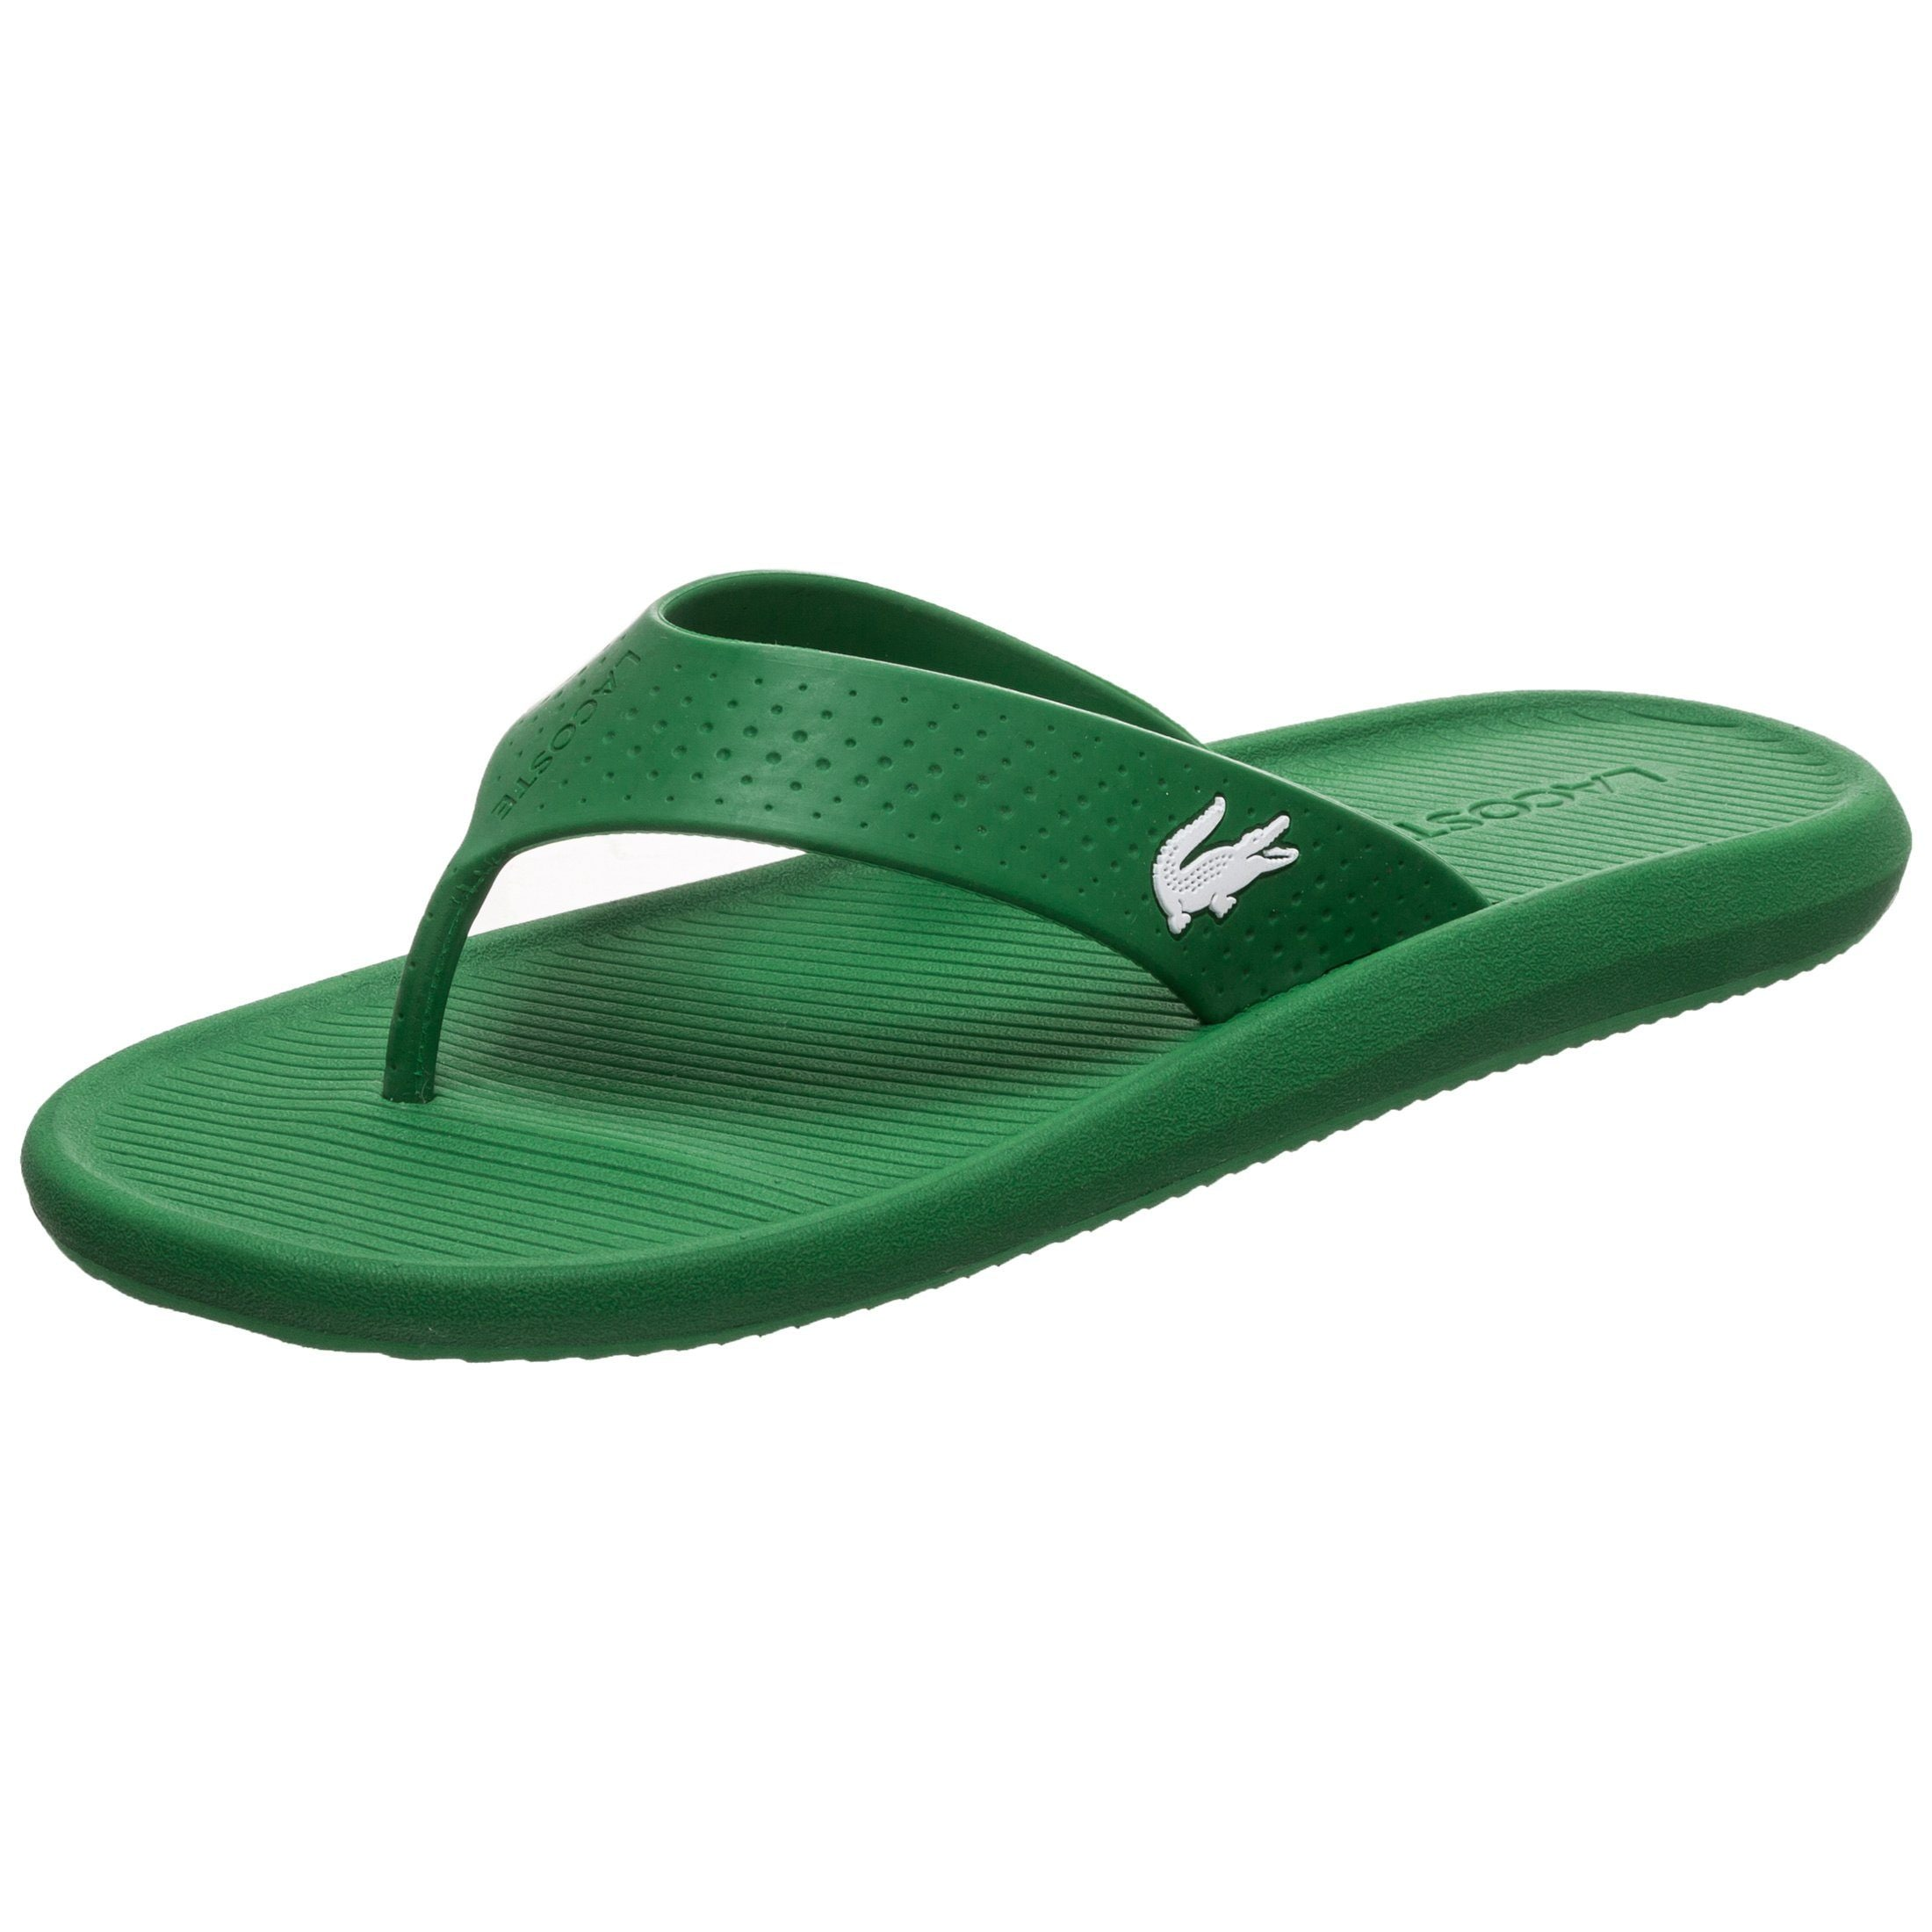 Lacoste Zehentrenner Croco | Schuhe > Sandalen & Zehentrenner | Lacoste